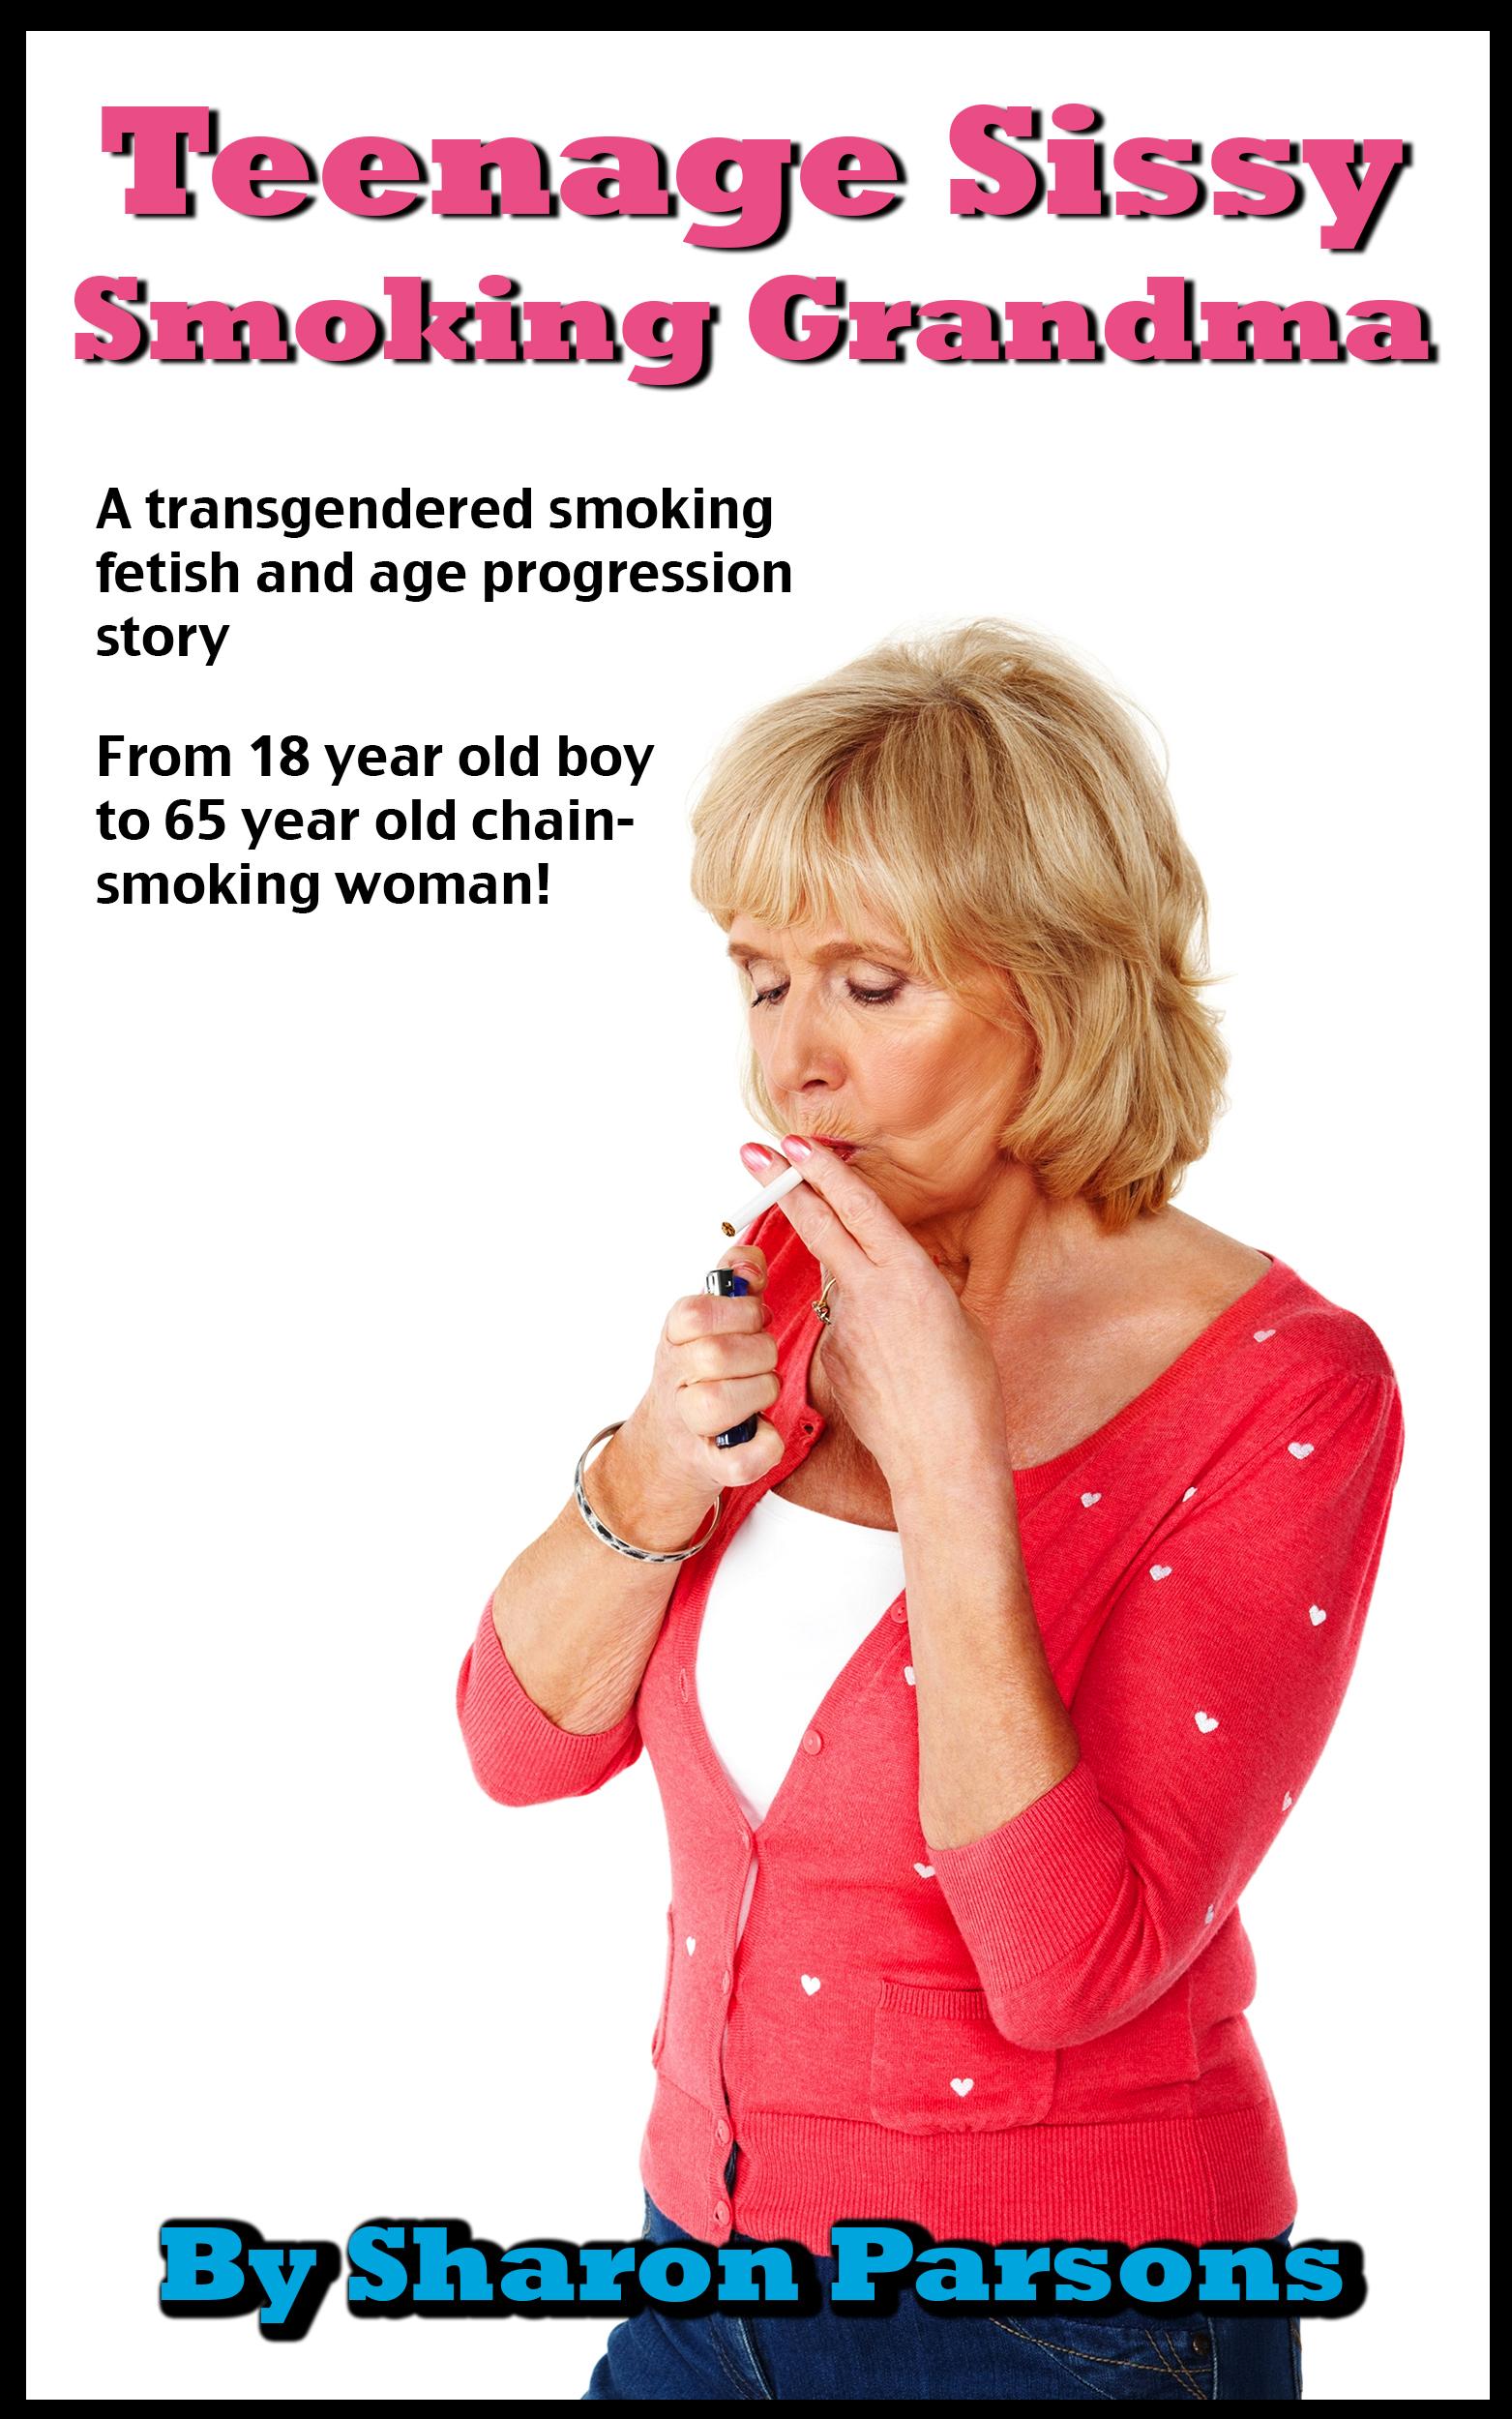 Teenage Sissy Smoking Grandma Ch 1 Bigcloset Topshelf